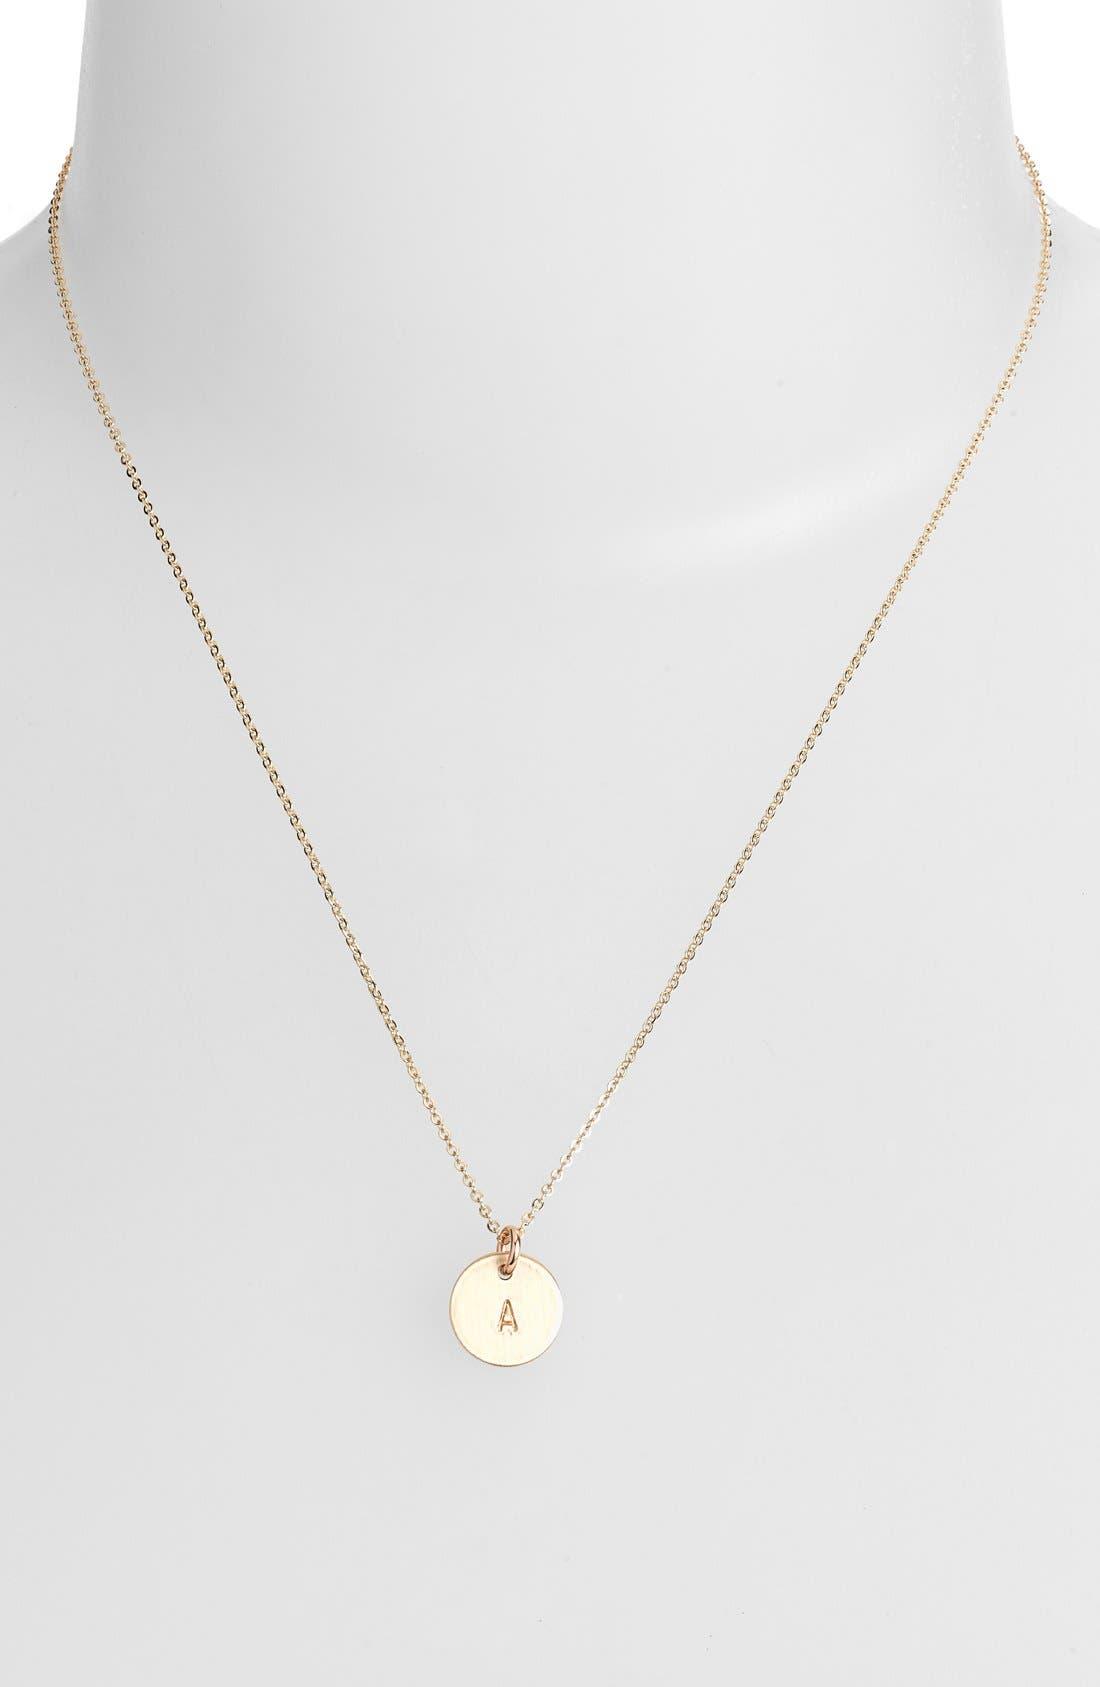 NASHELLE, 14k-Gold Fill Initial Mini Circle Necklace, Alternate thumbnail 2, color, 14K GOLD FILL A